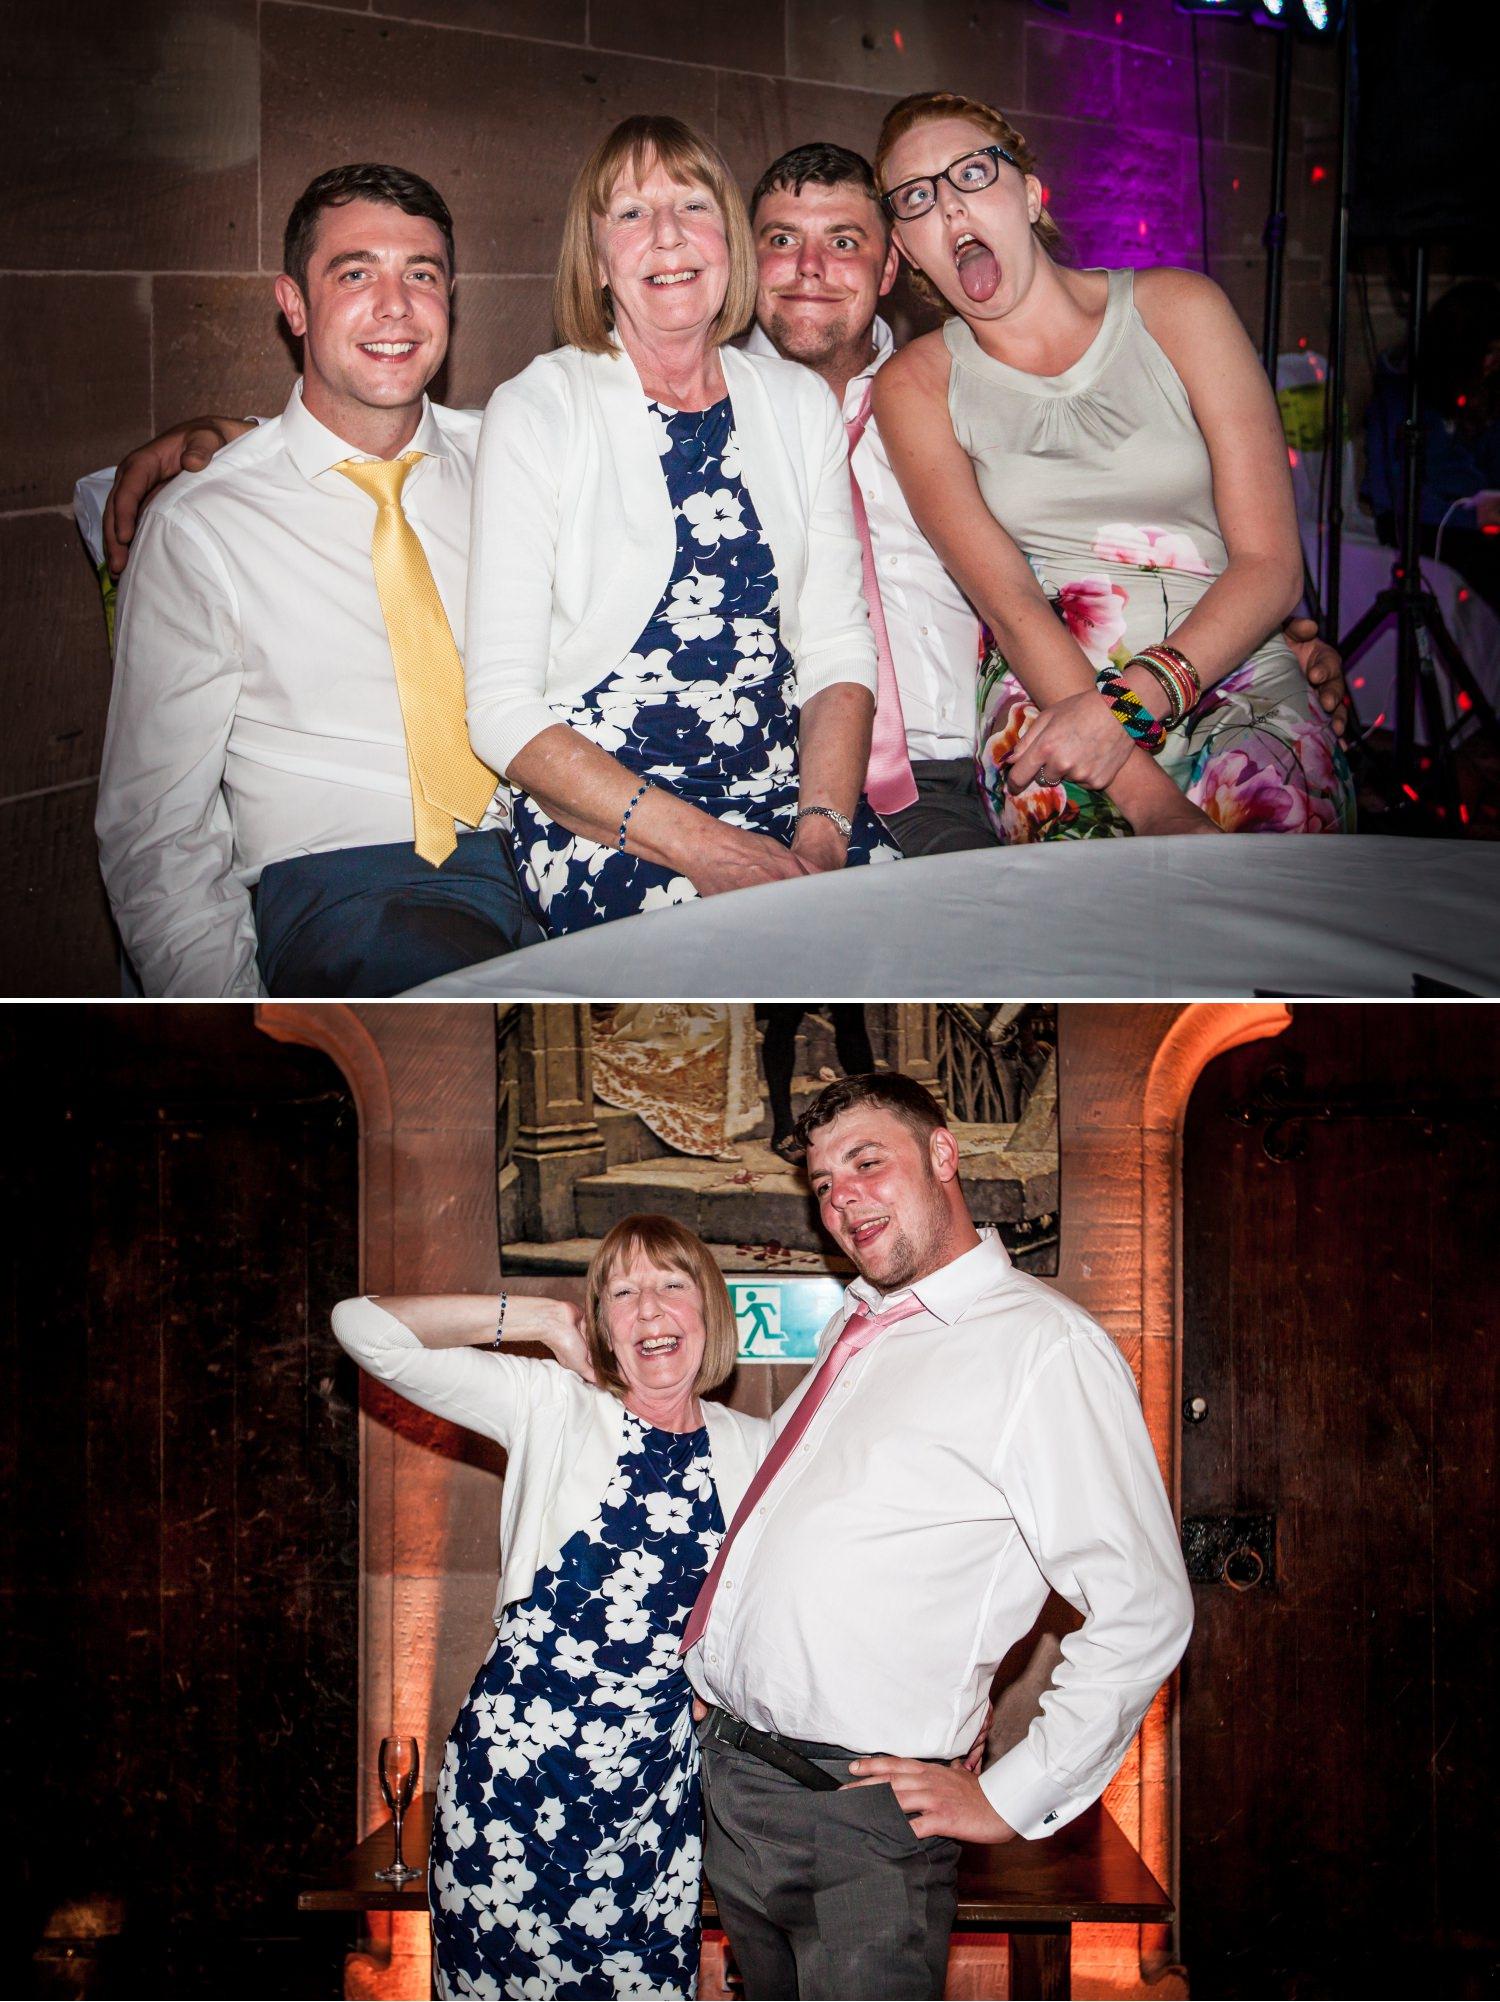 Wedding Photographers Peckforton Castle, Cheshire